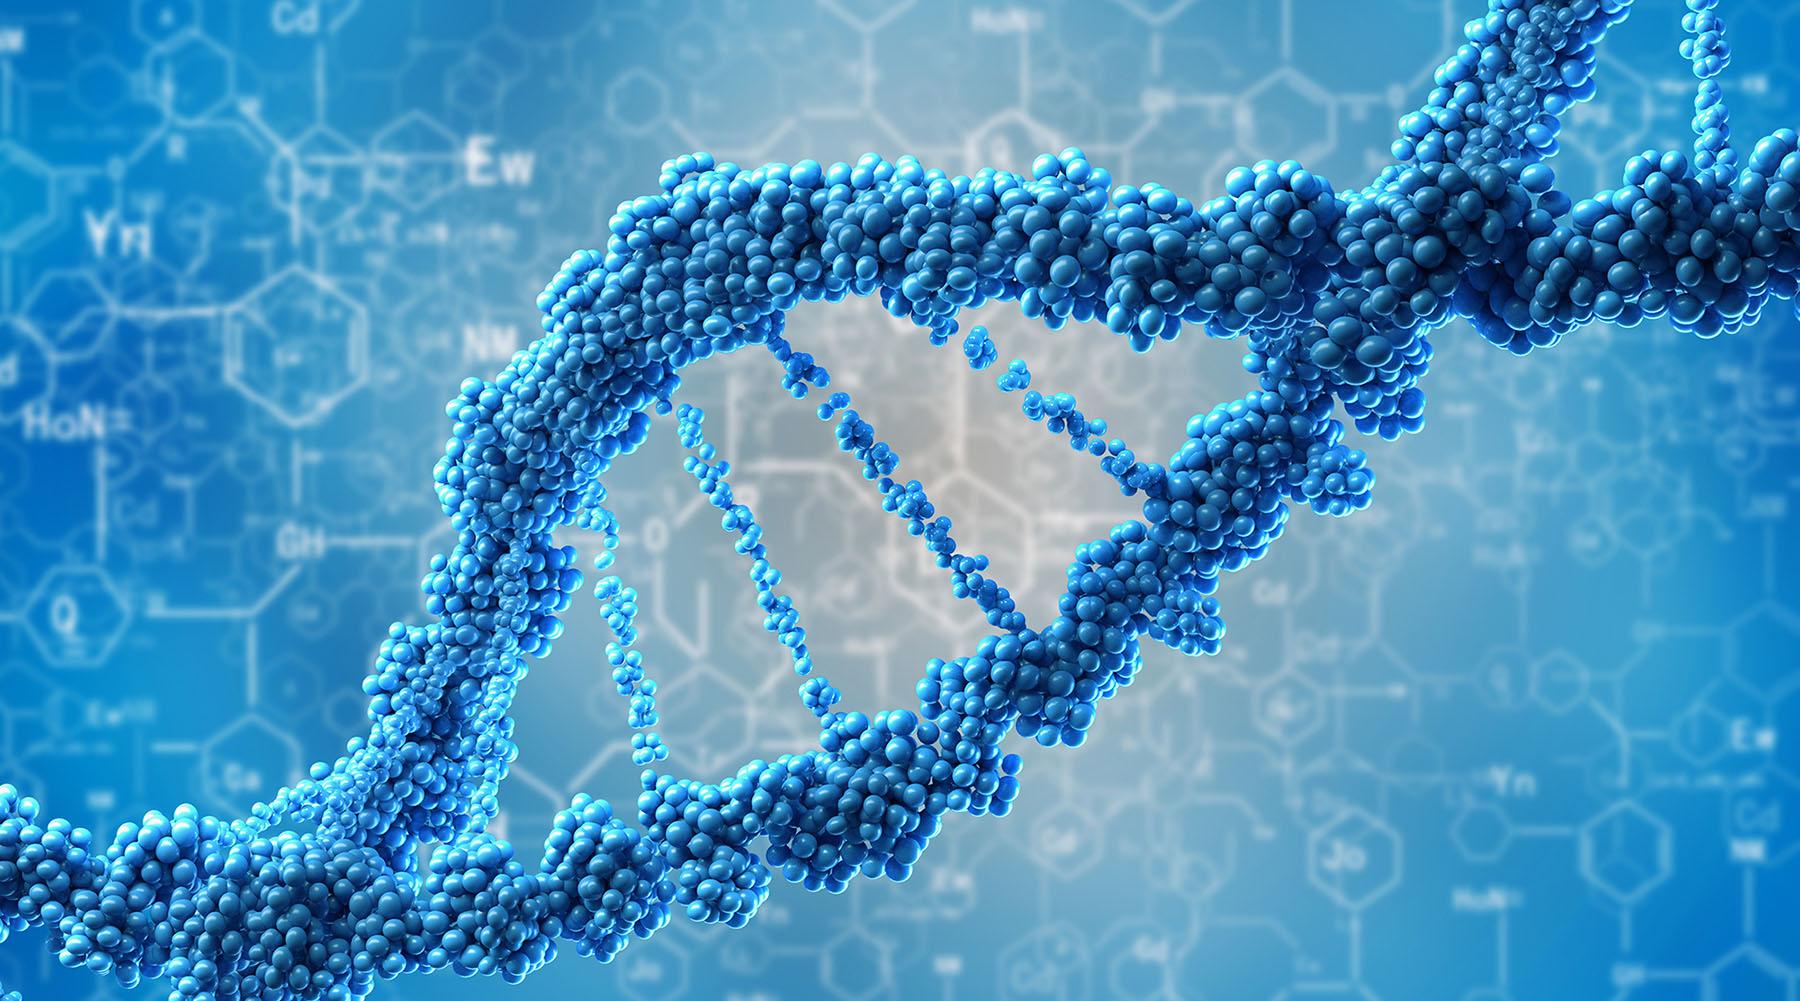 ICGEB Industrial Biotechnology